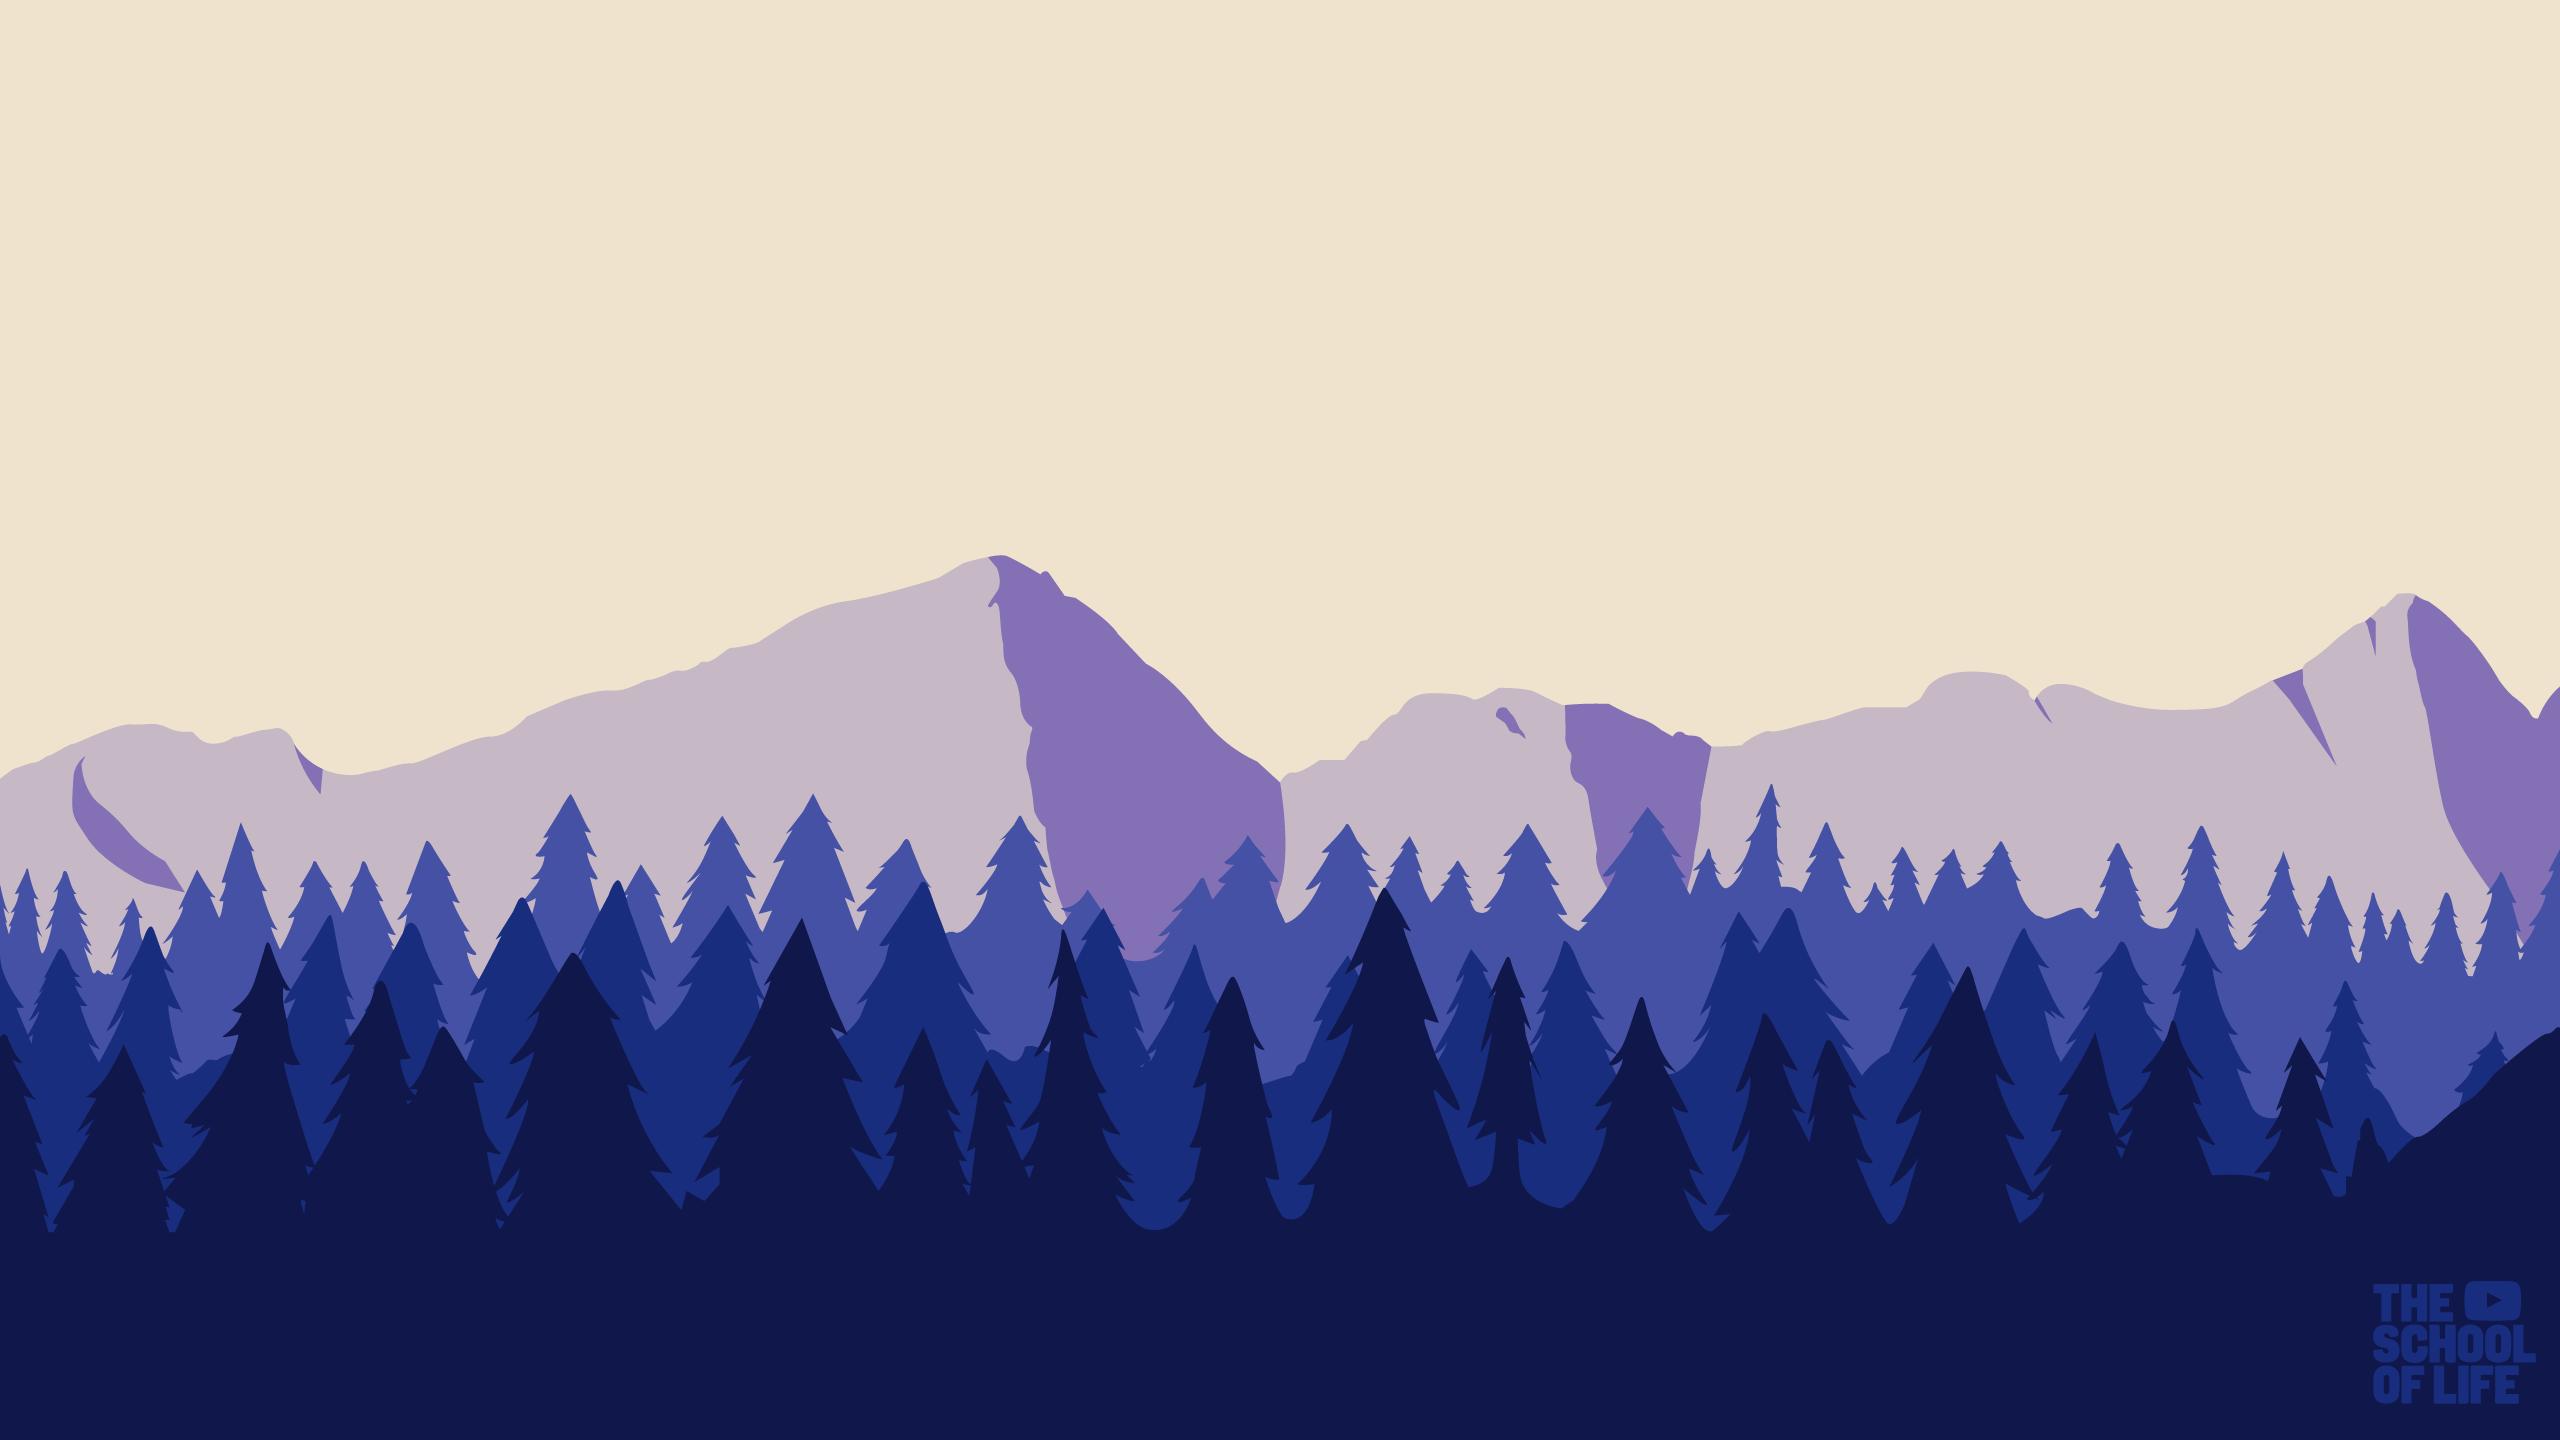 Masaüstü Manzara Orman Illüstrasyon Dağlar Dijital Sanat